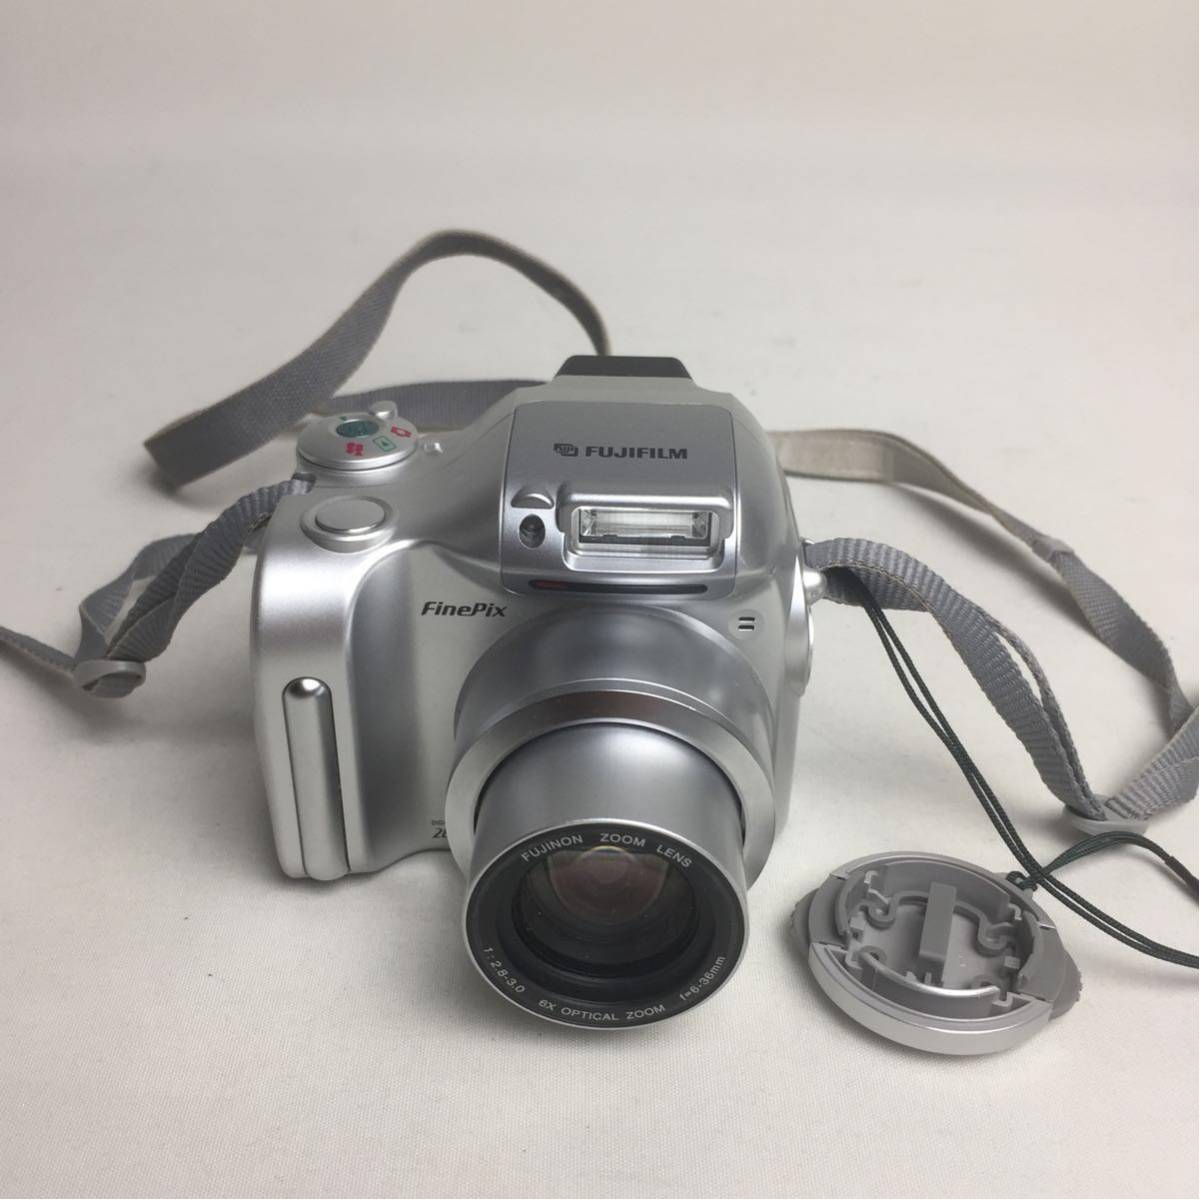 Z019 ★FUJIFILM FinePix 2800Zoom 1:2.8-3.0 6X OPTICAL ZOOM f=6-36mm デジタルカメラ